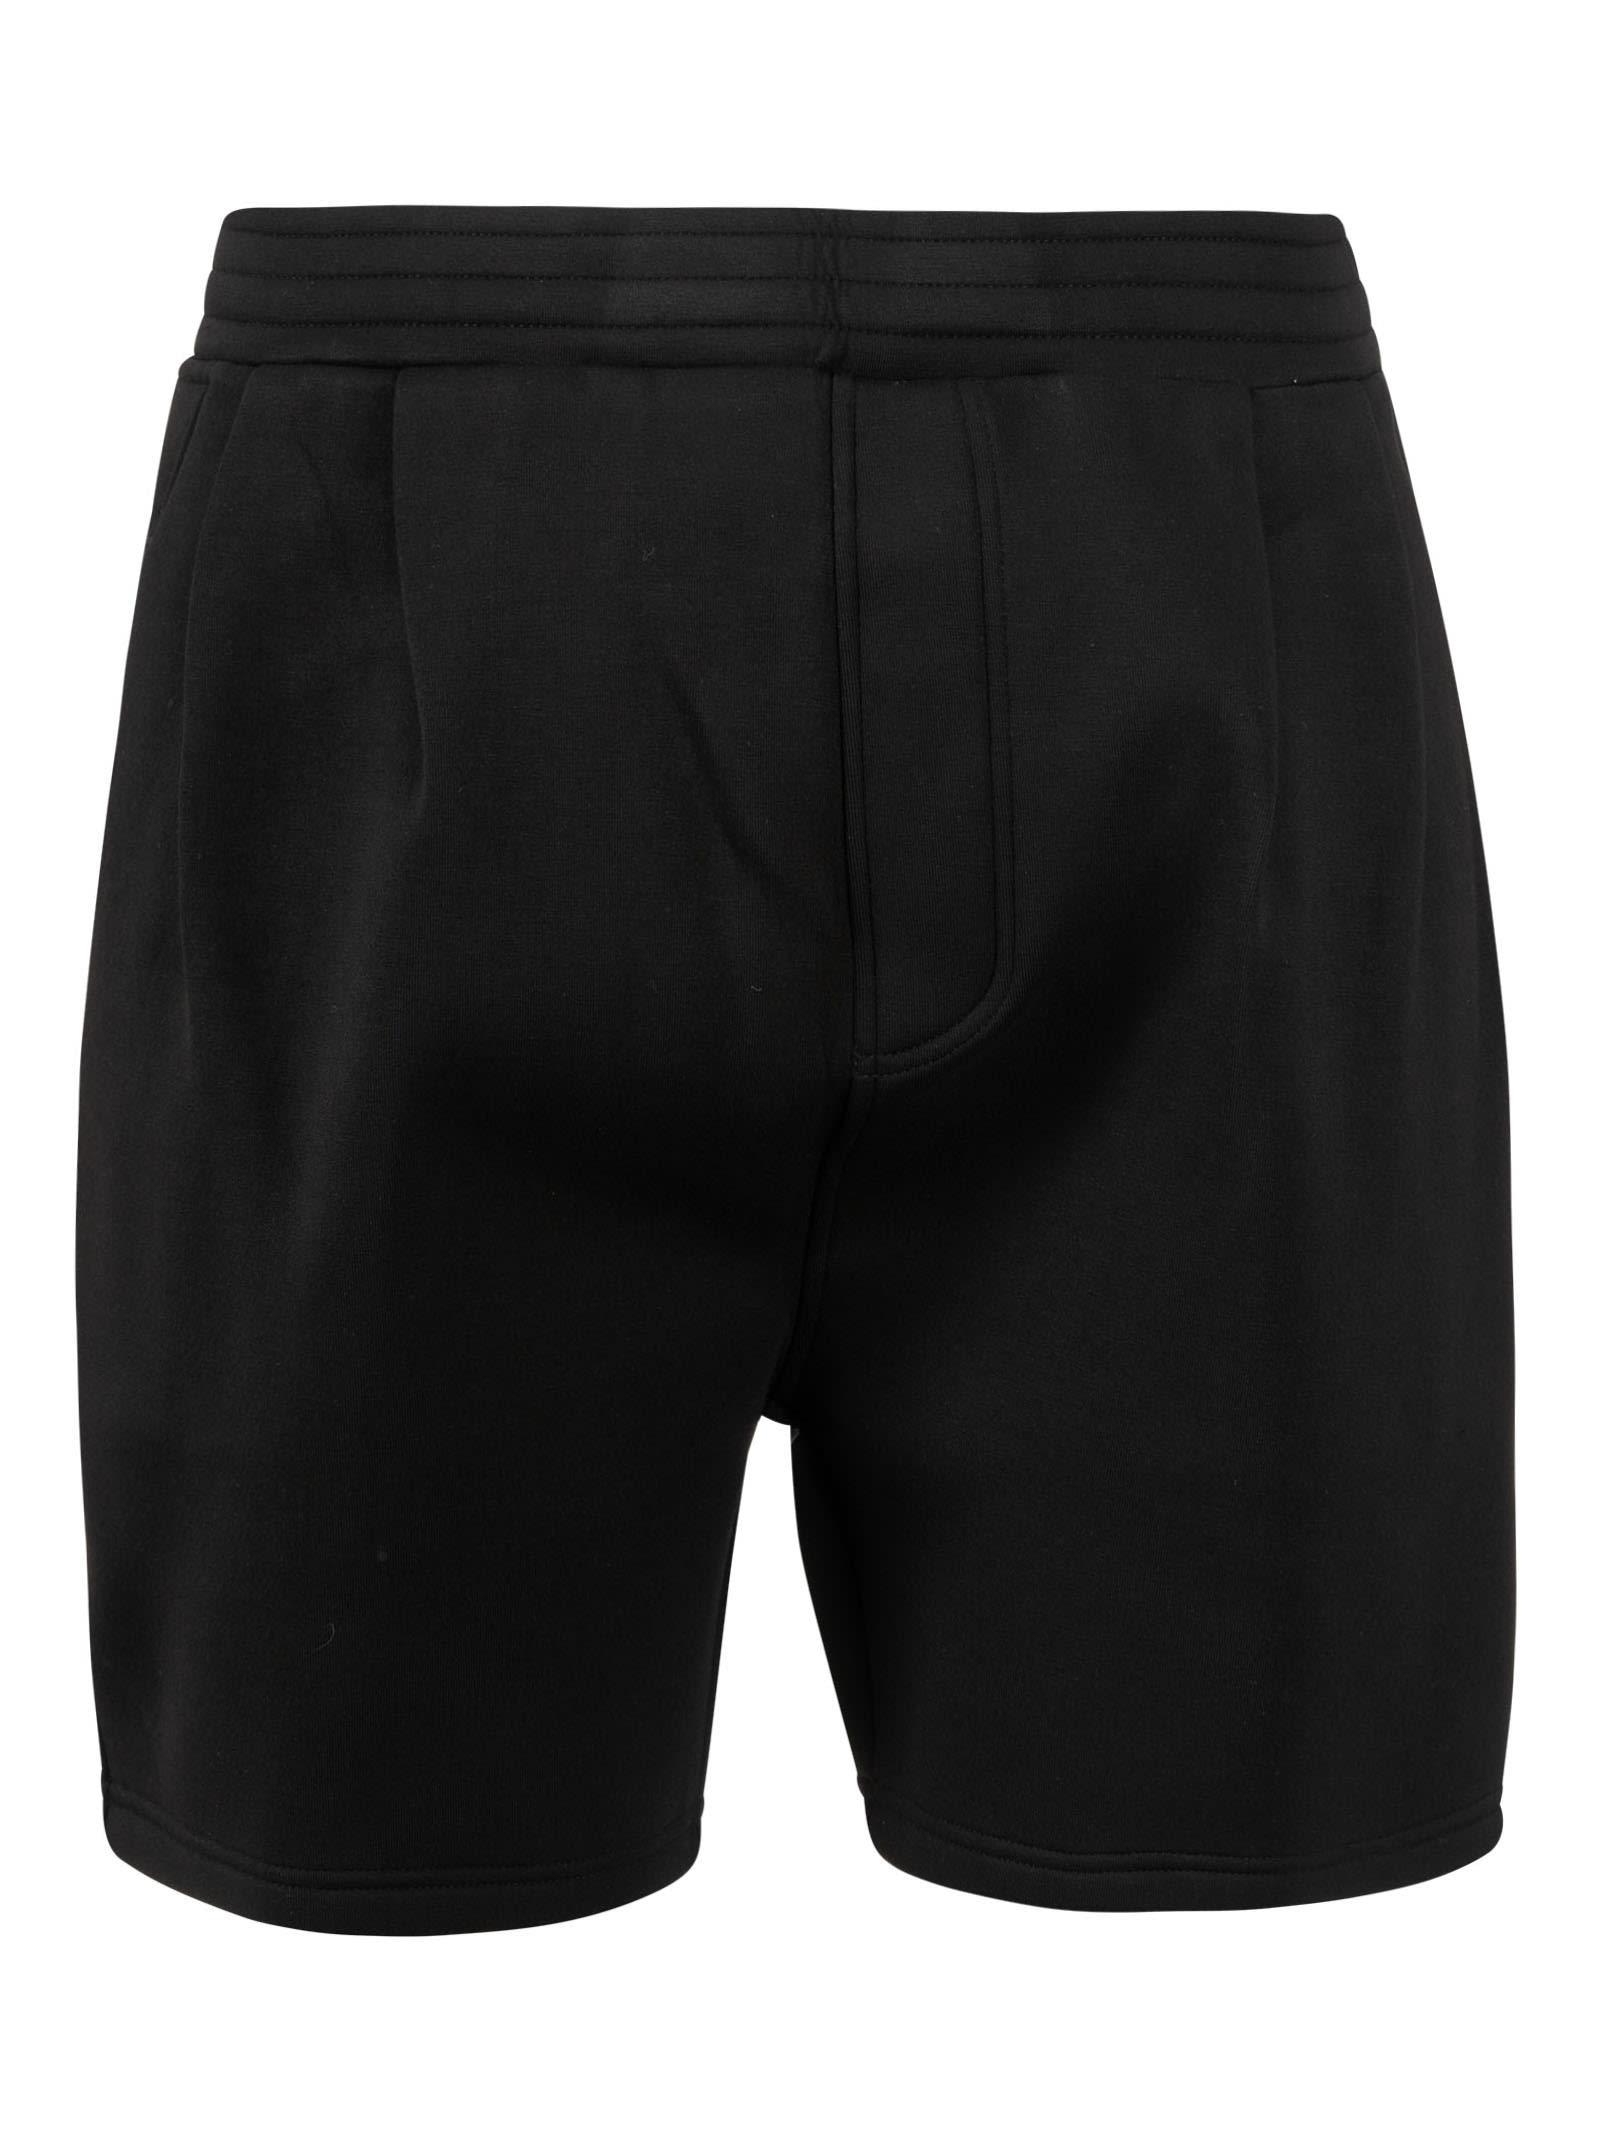 Neil Barrett Shorts SLIM NAVAL SHORTS